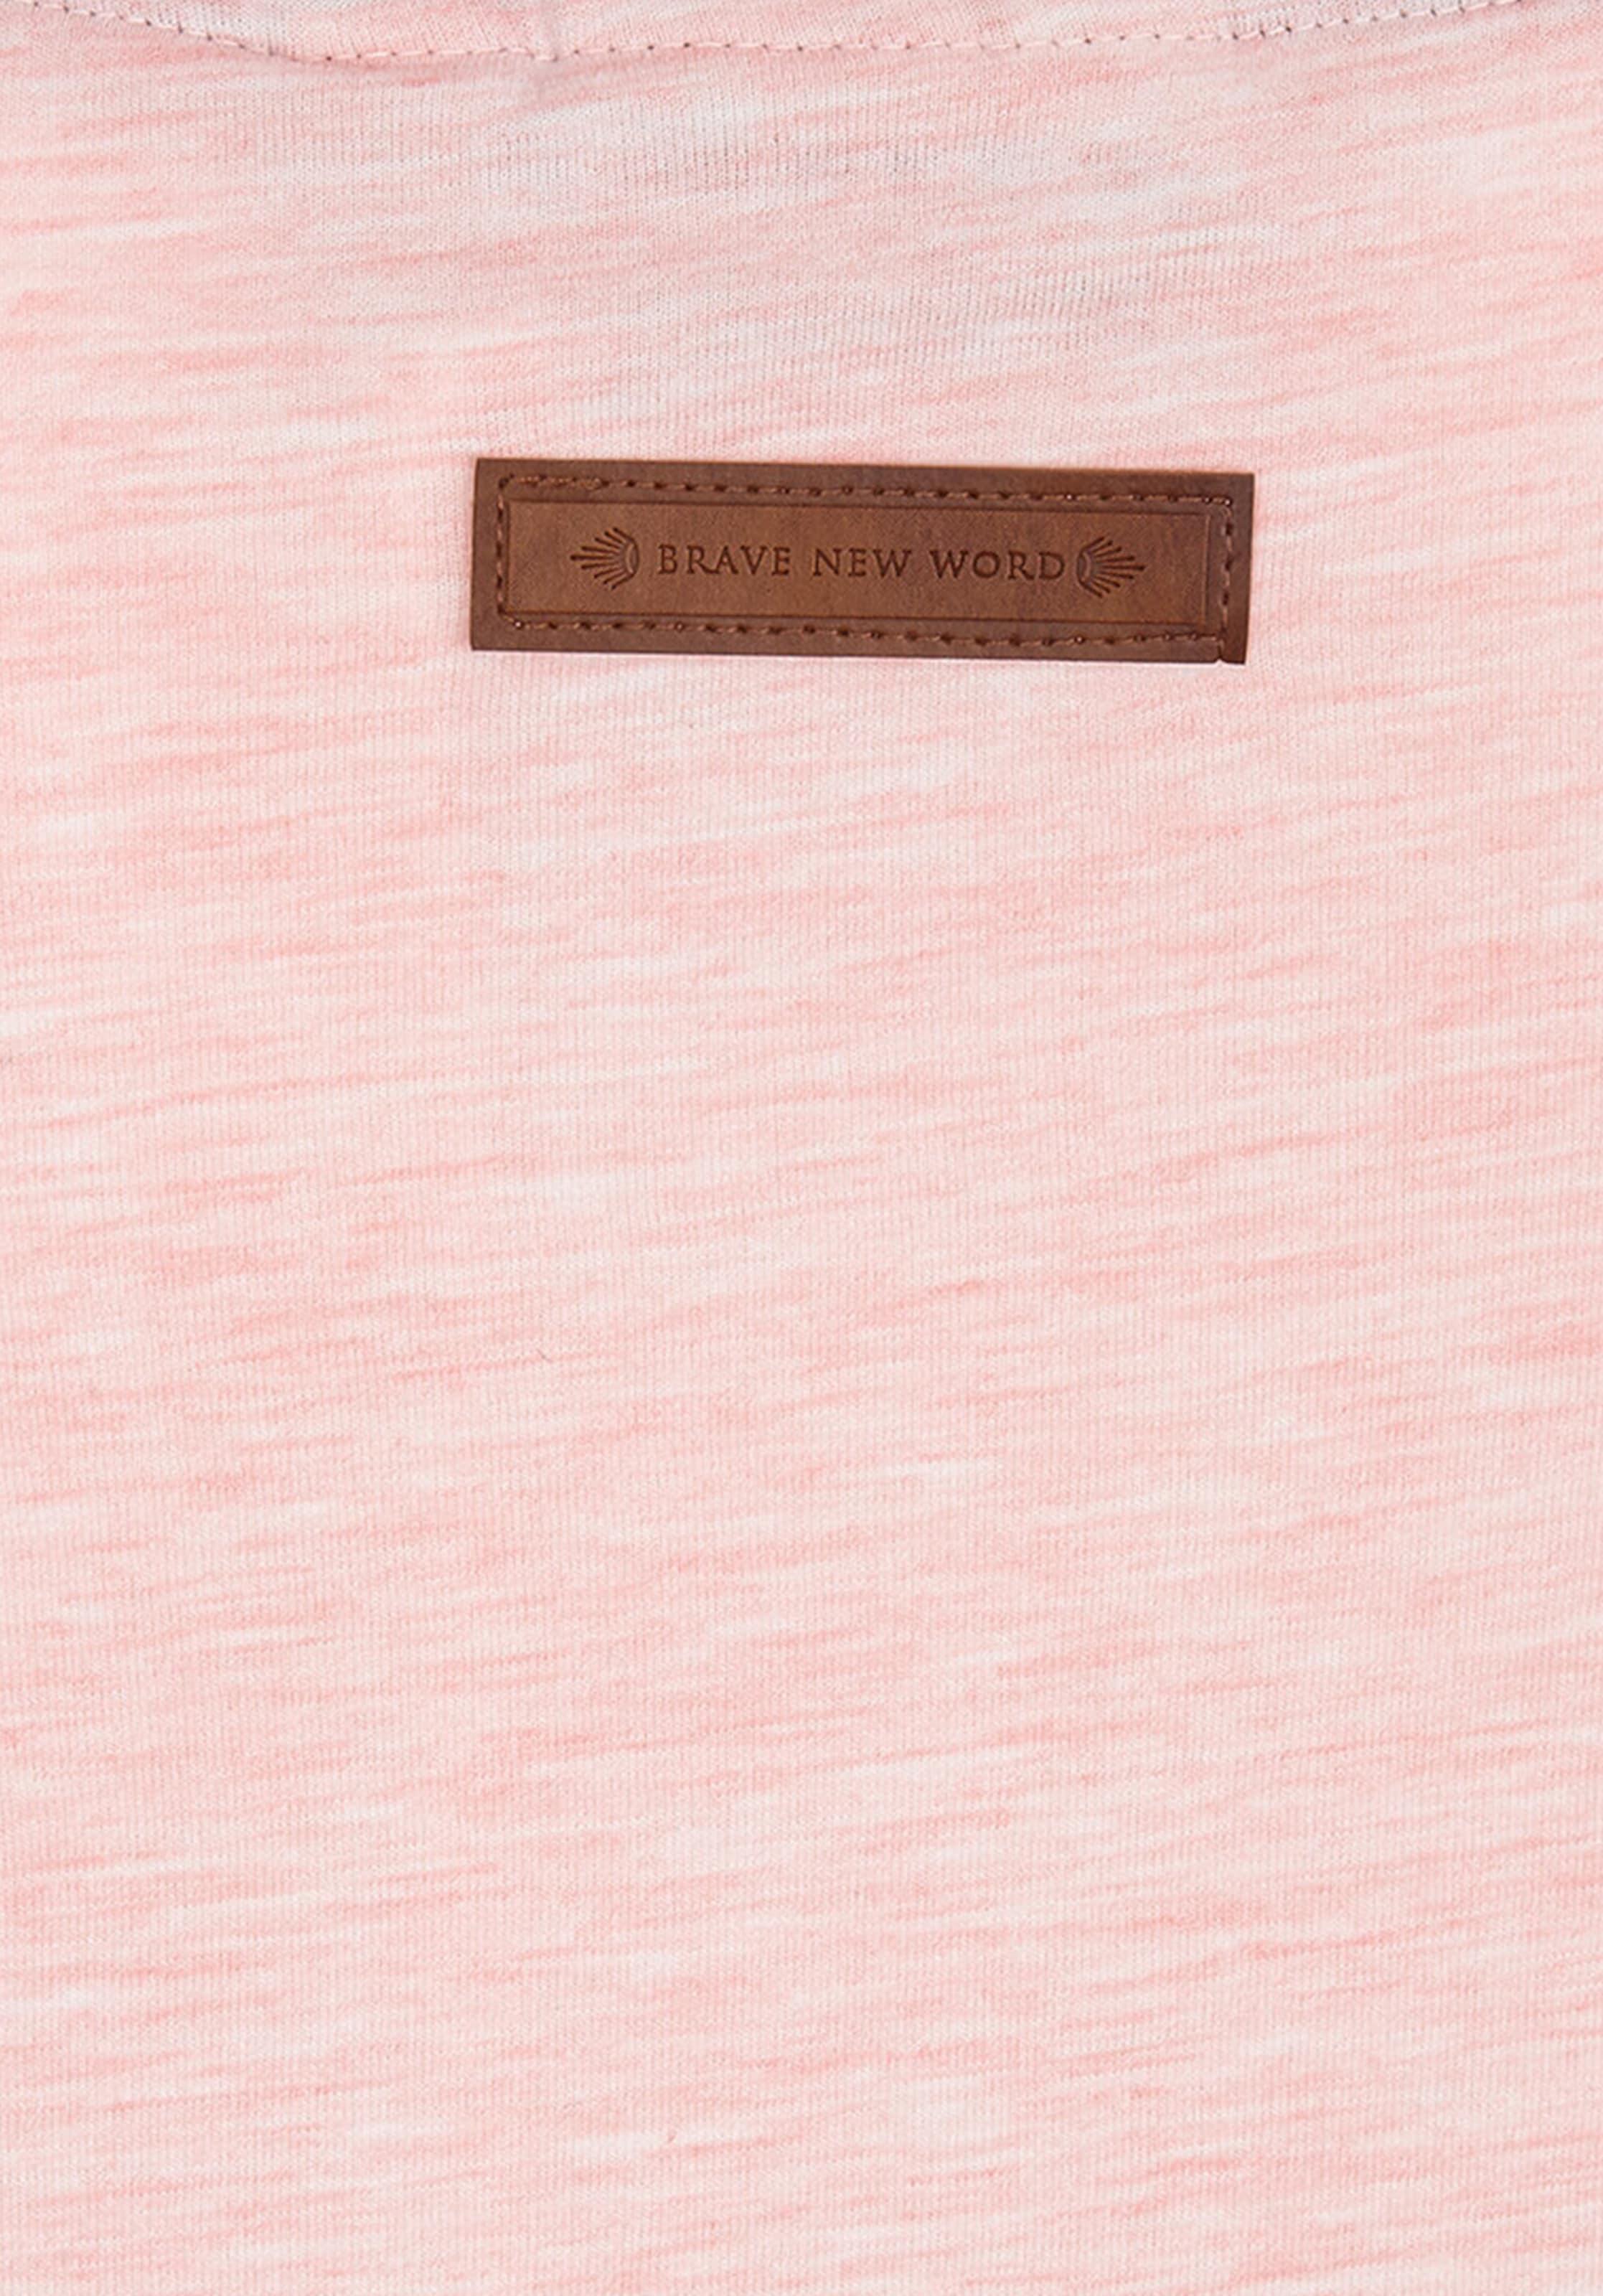 In In 'mandy' In Rosa Sweatshirt Sweatshirt 'mandy' Naketano Rosa Naketano Naketano Sweatshirt 'mandy' P8wOknX0